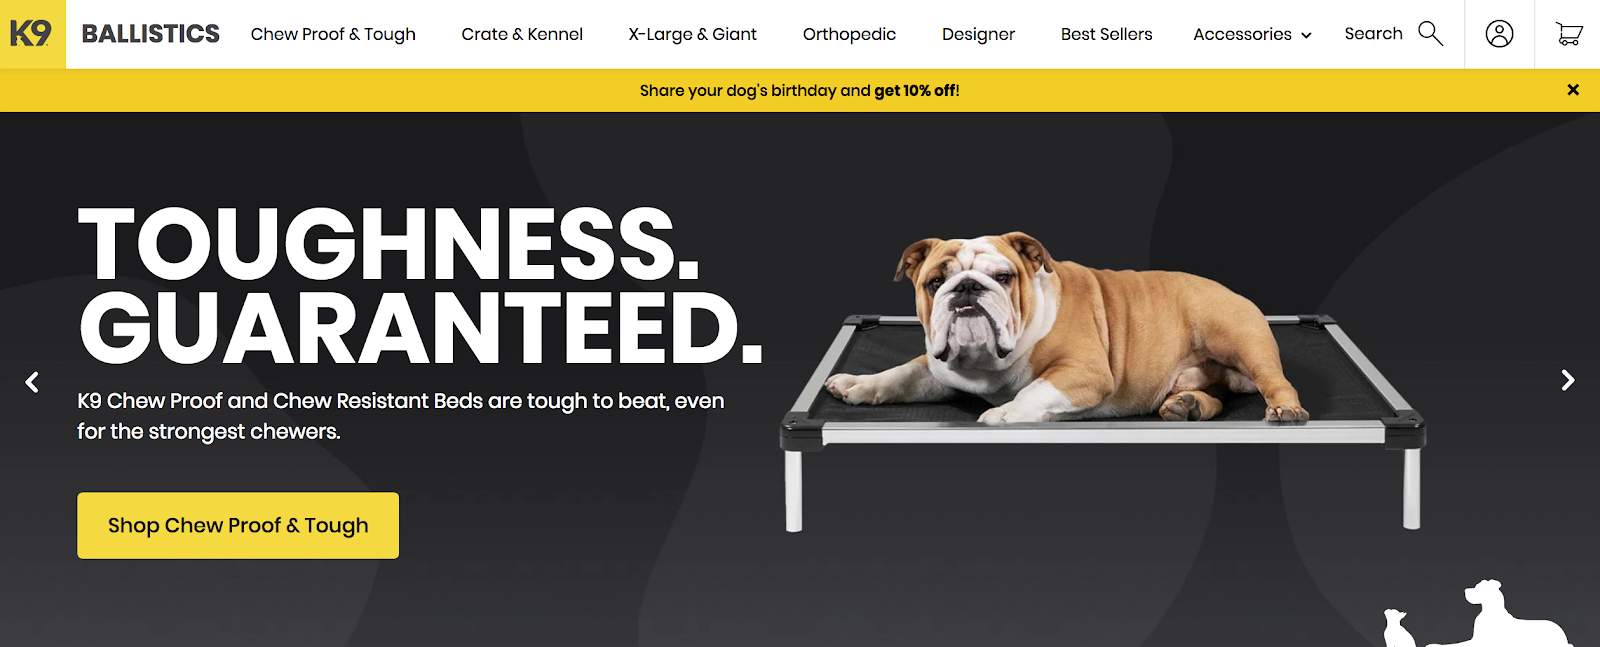 Pet Brand looking for Influencers - K9 Ballistics